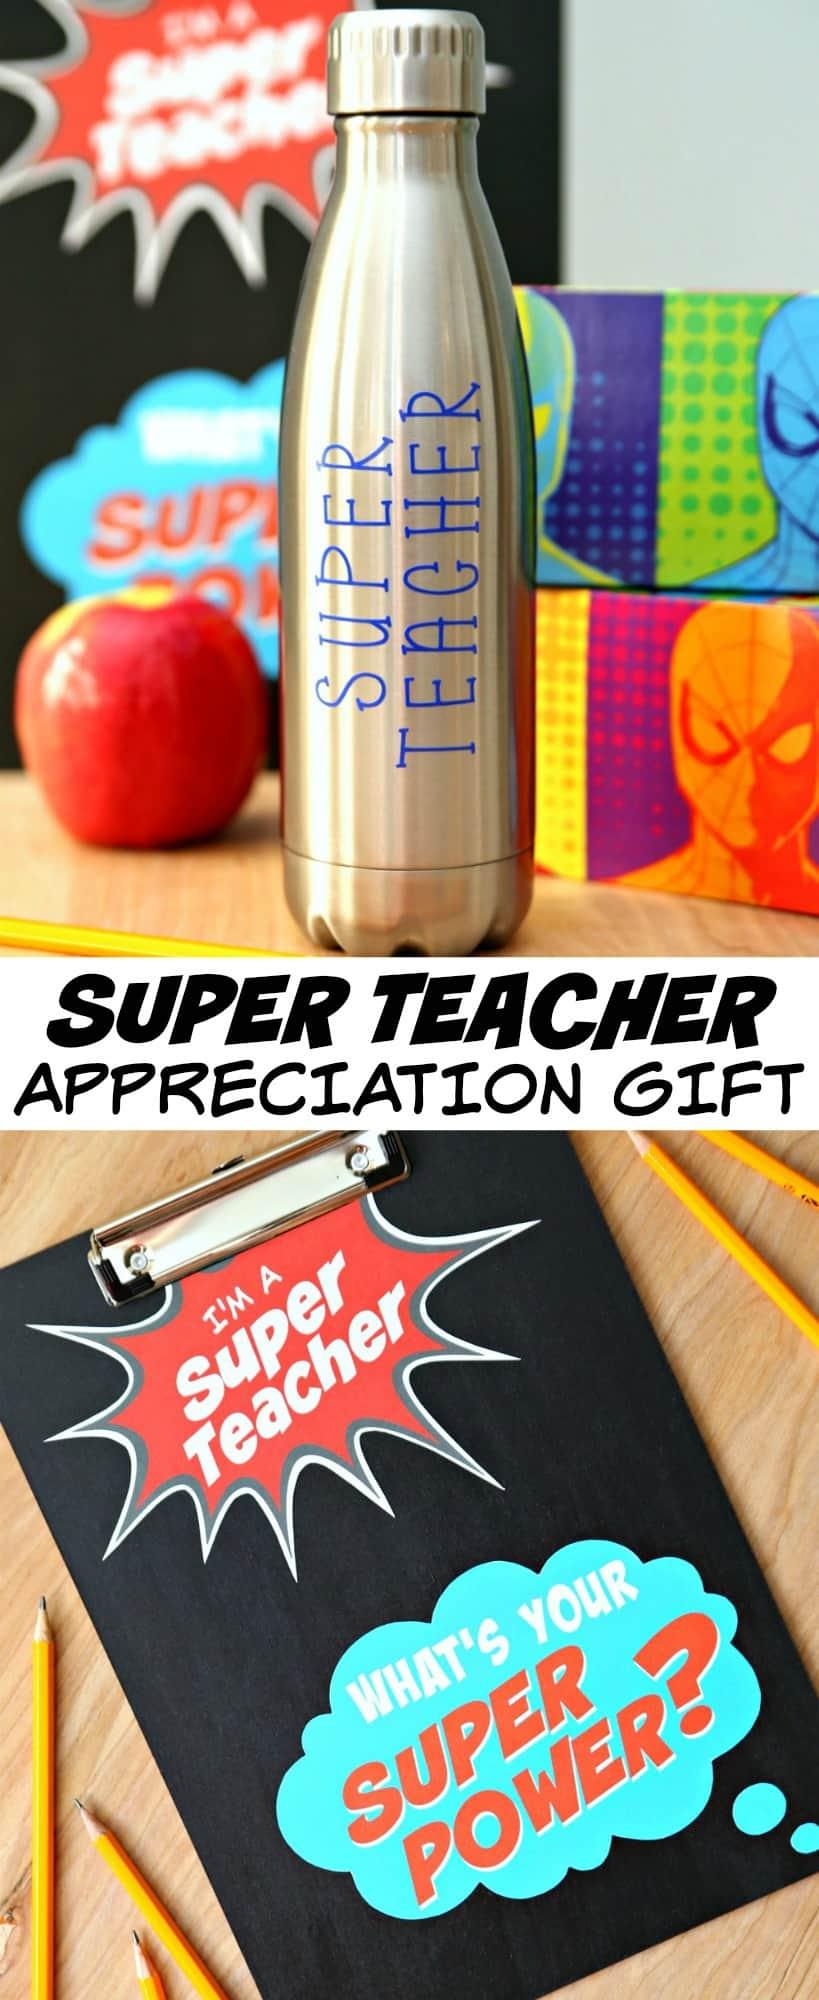 Super Teacher Appreciatio Gift 2